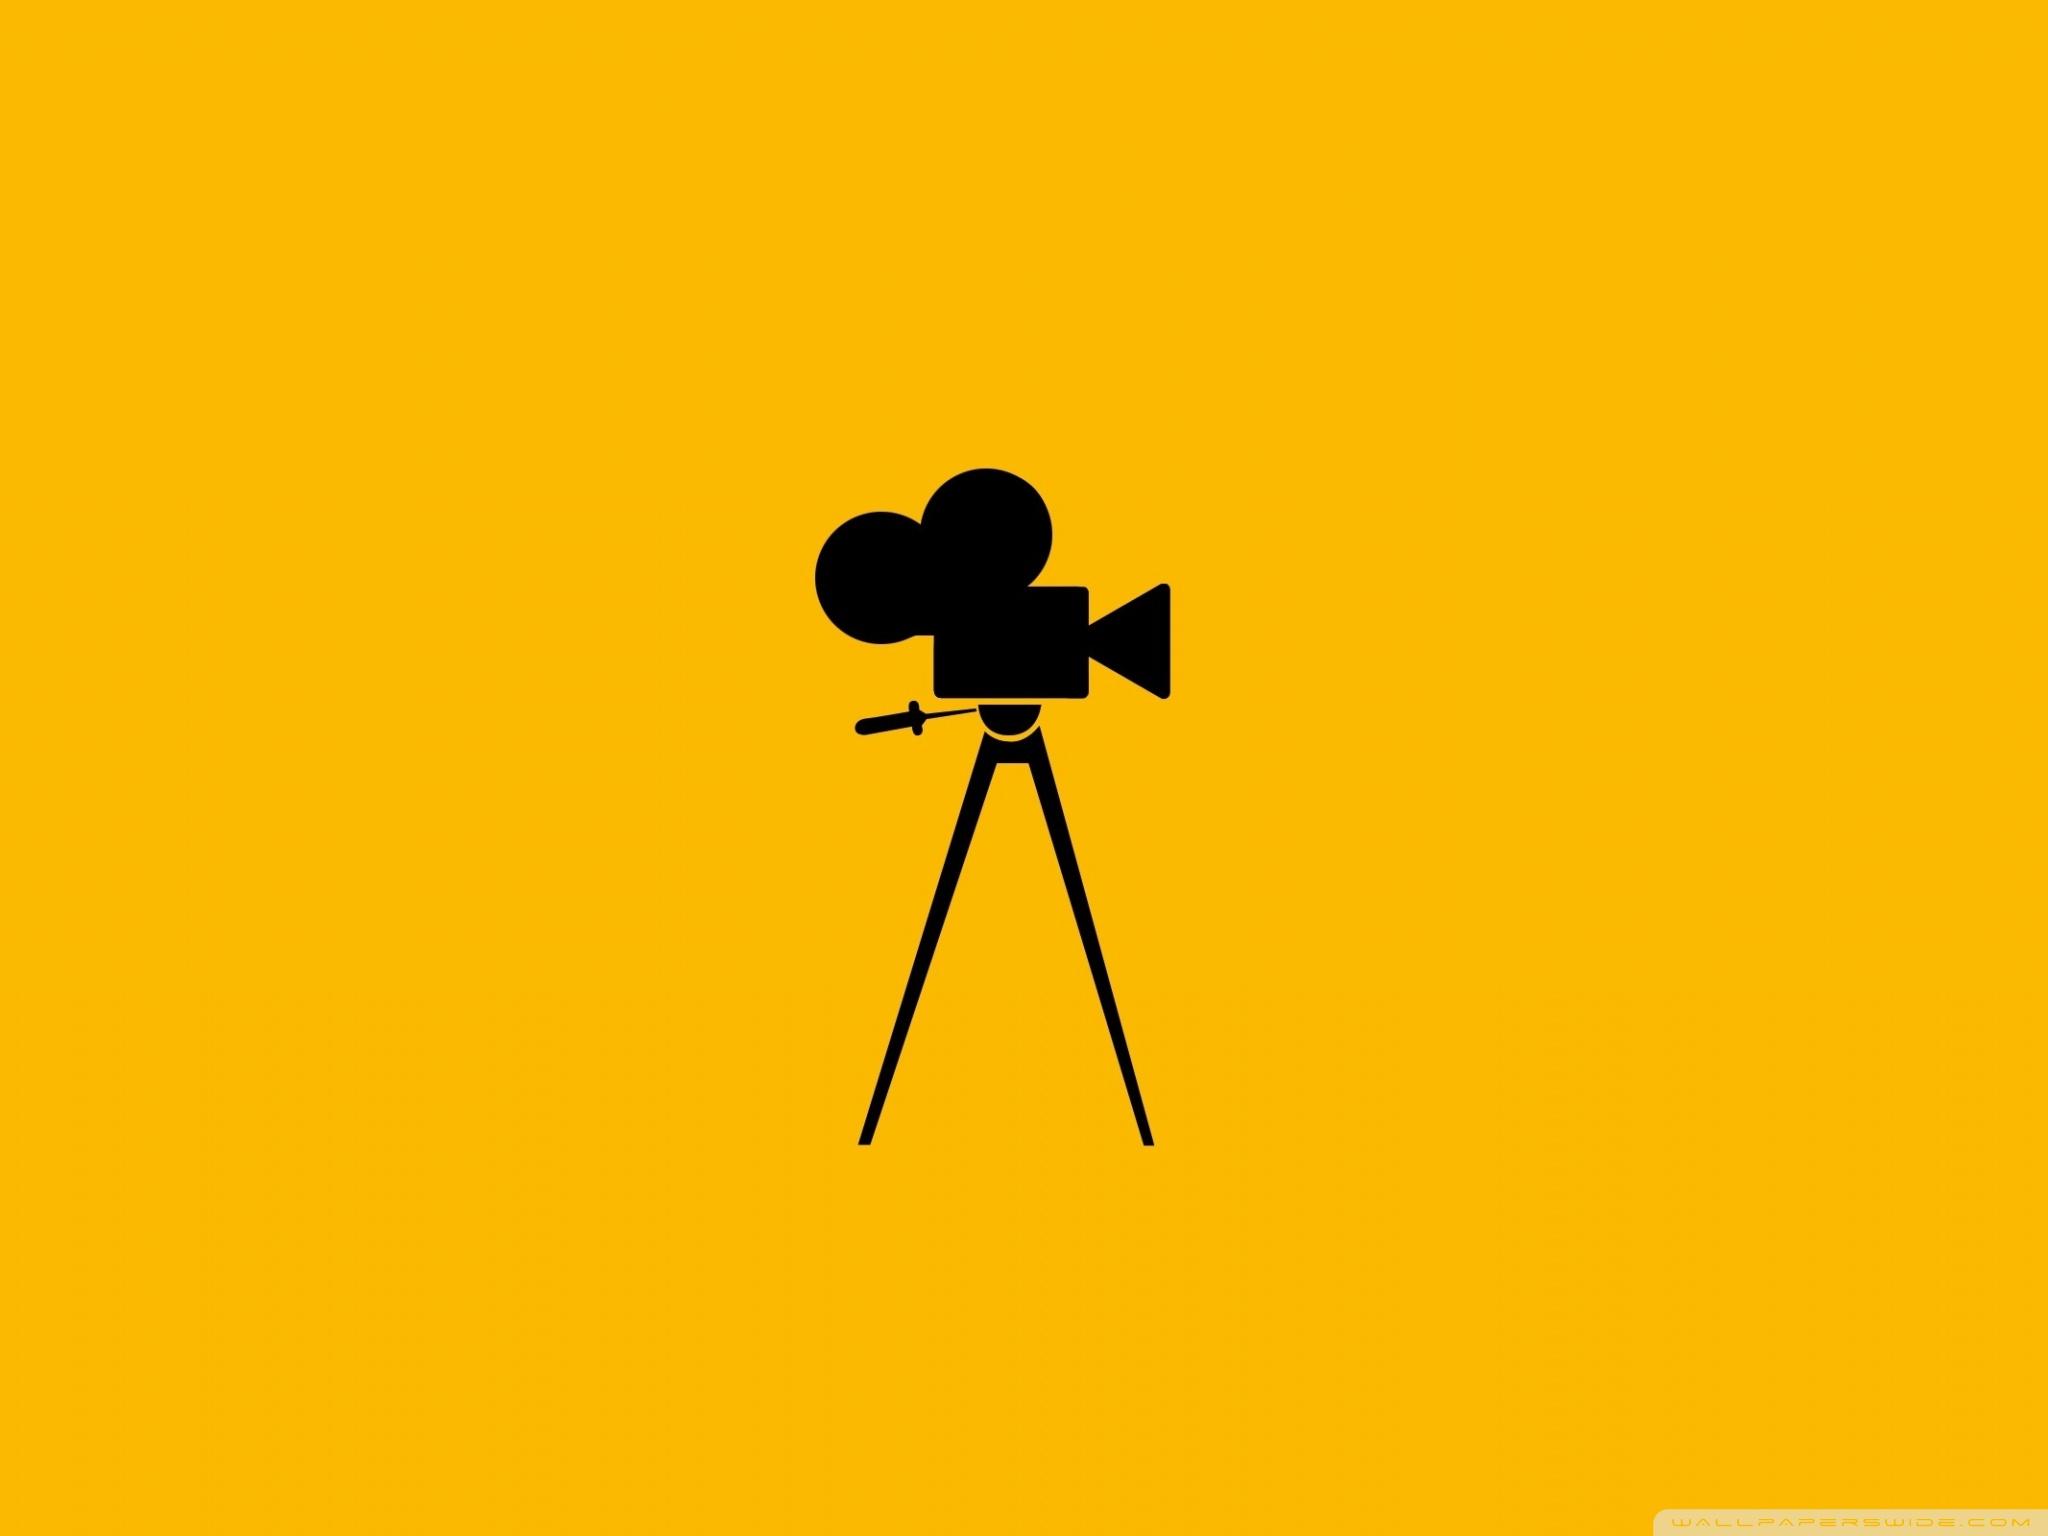 Film Camera Ultra HD Desktop Background Wallpaper for 4K UHD TV 2048x1536